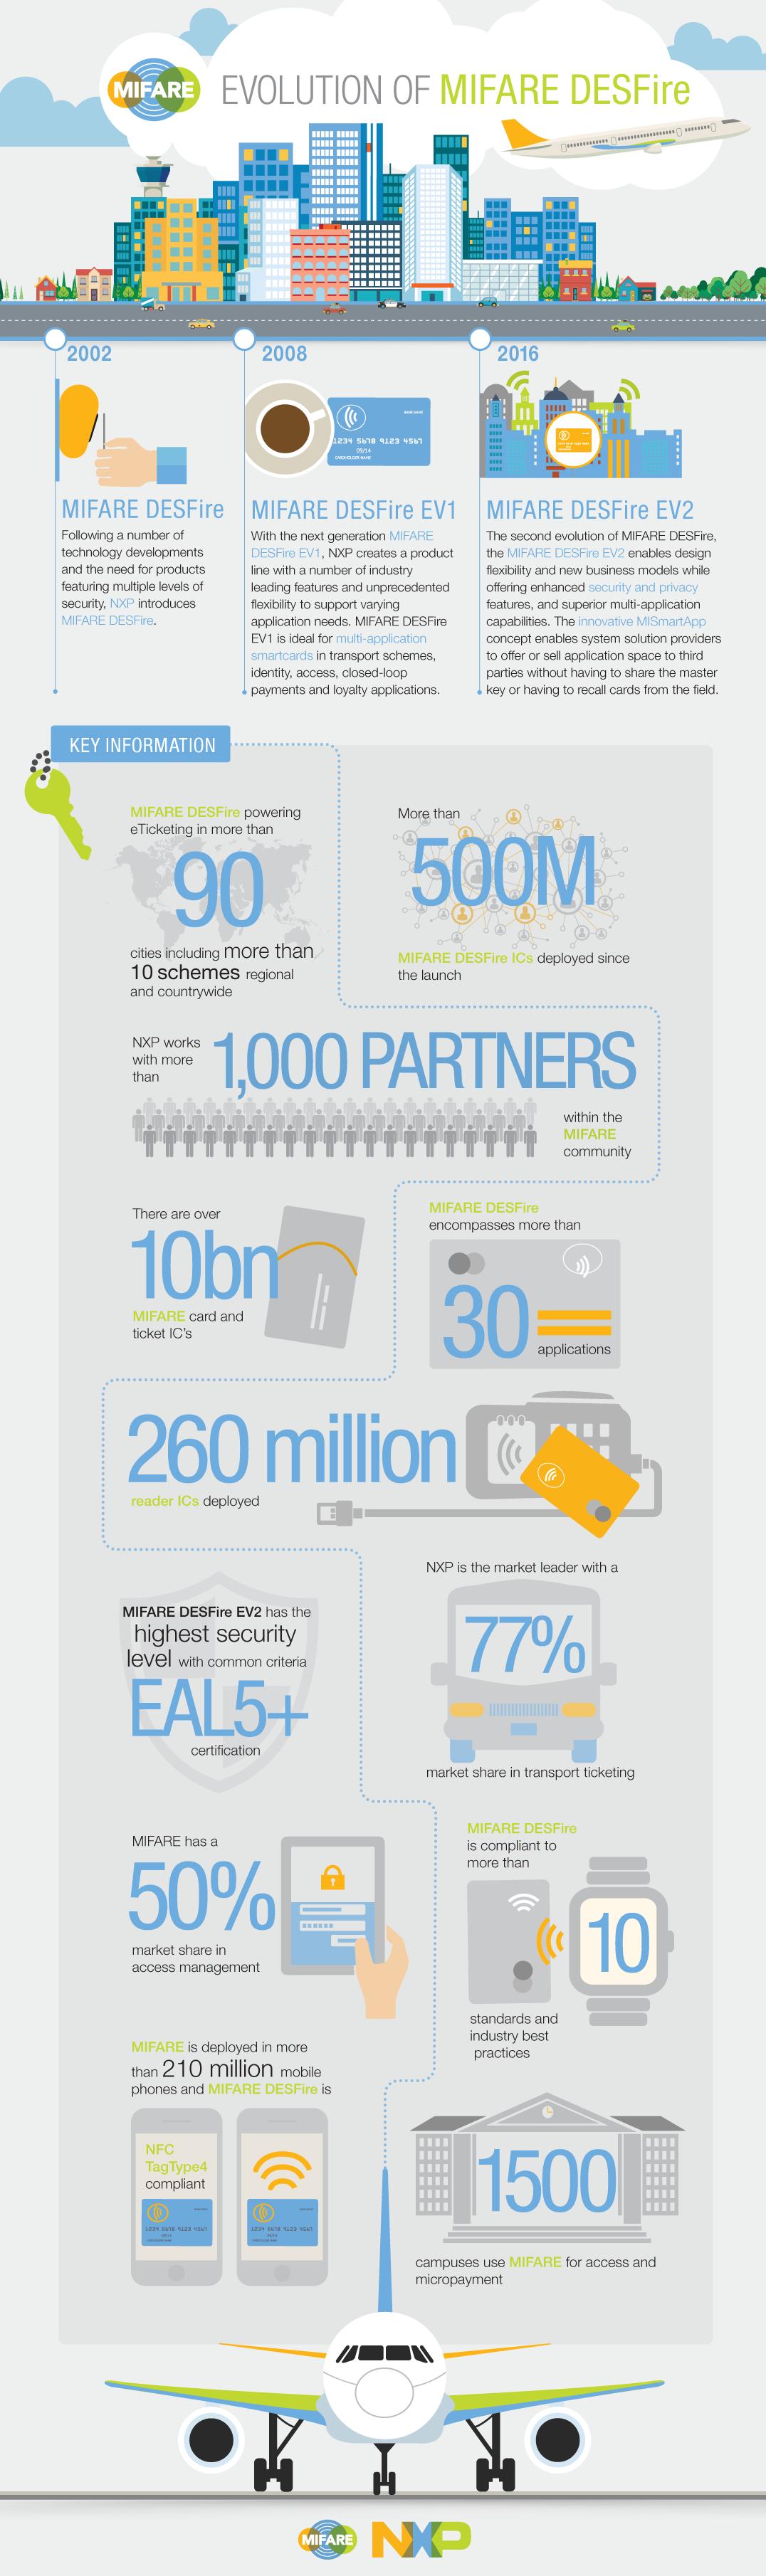 MIFARE DESFire evolution_infographic